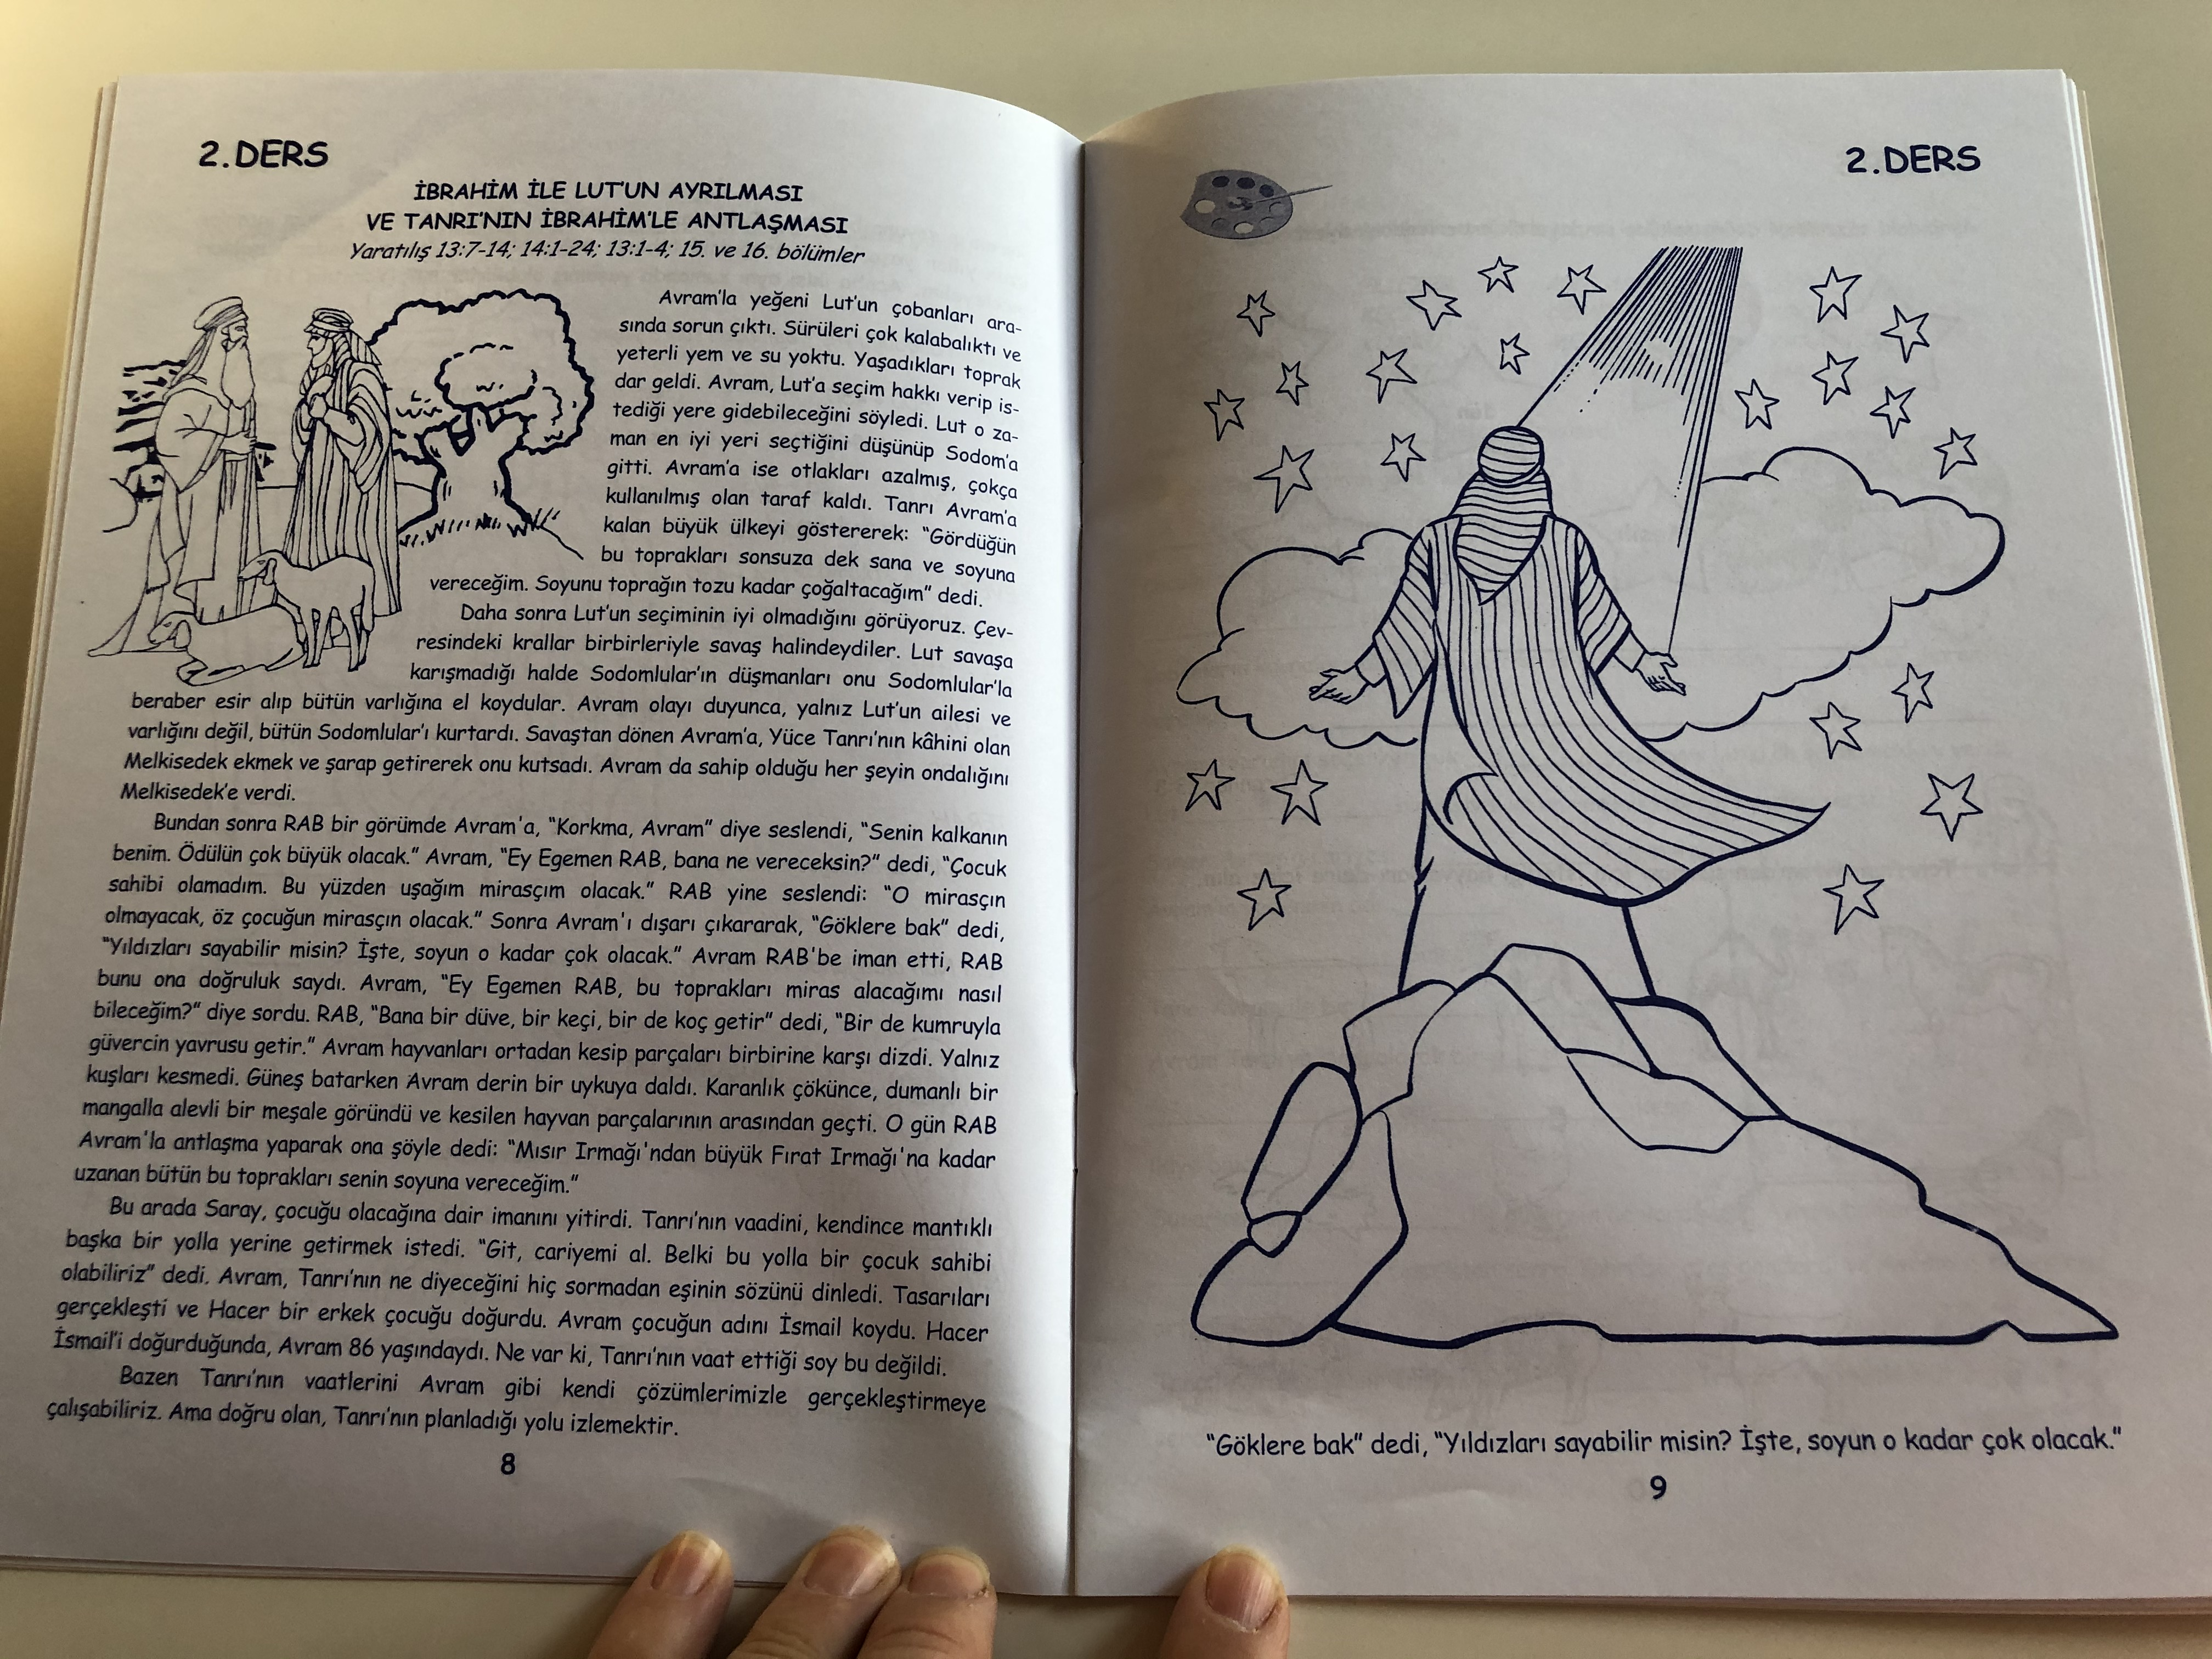 ibrahim-al-ma-k-tab-abraham-turkish-language-coloring-book-workbook-4.jpg